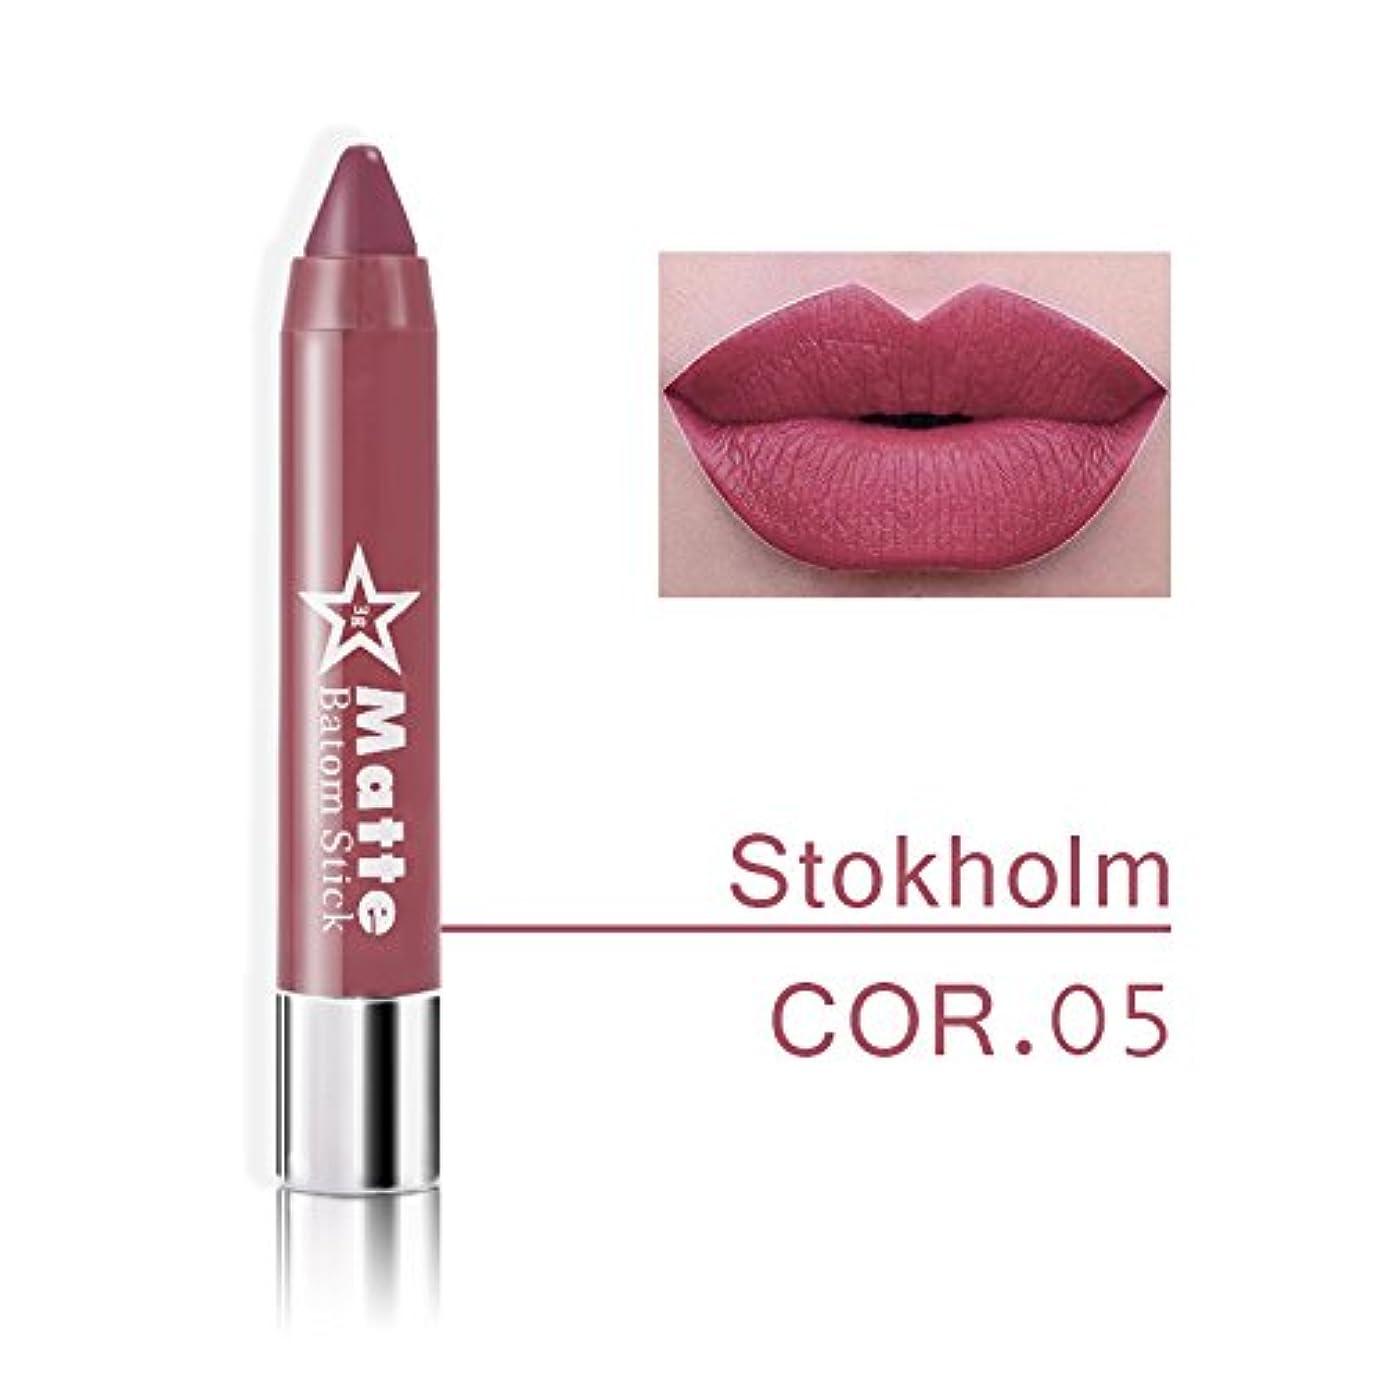 活力意識獣Miss Rose Brand lips Matte Moisturizing Lipstick Makeup Lipsticks Waterproof matte Lip gloss Mate Lipsticks Make up